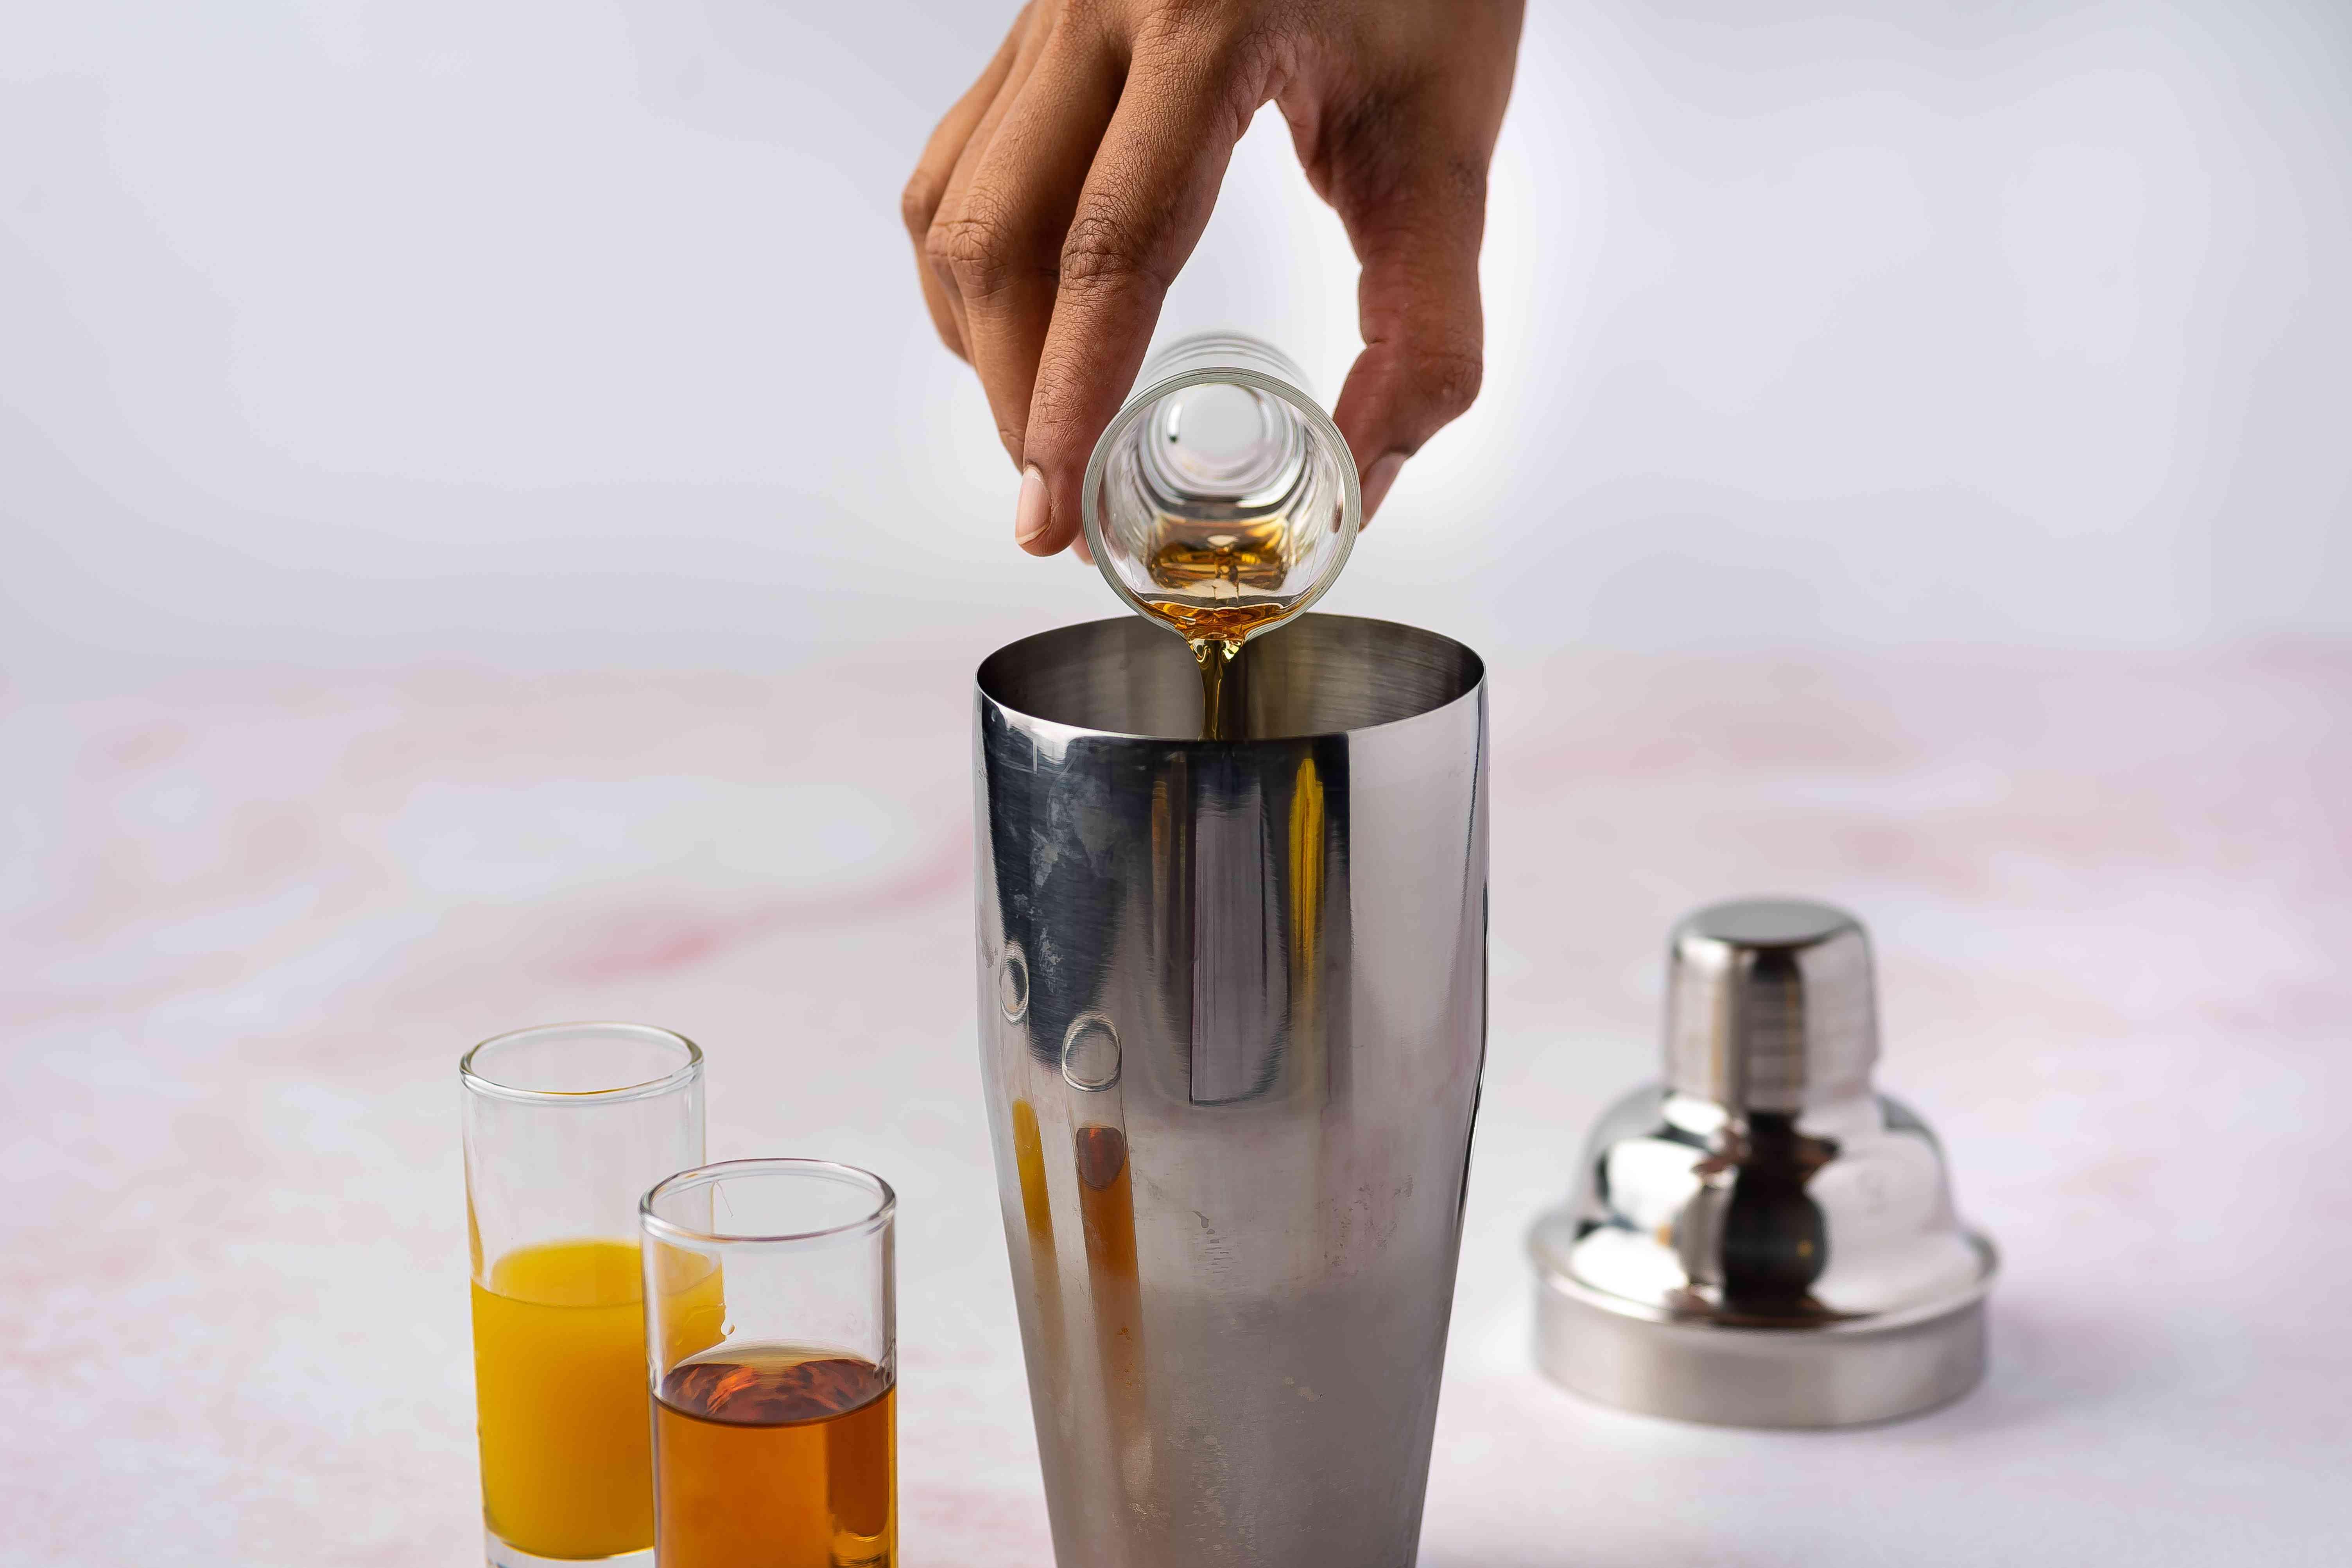 ice, cognac, orange liqueur, and orange juice in a cocktail shaker